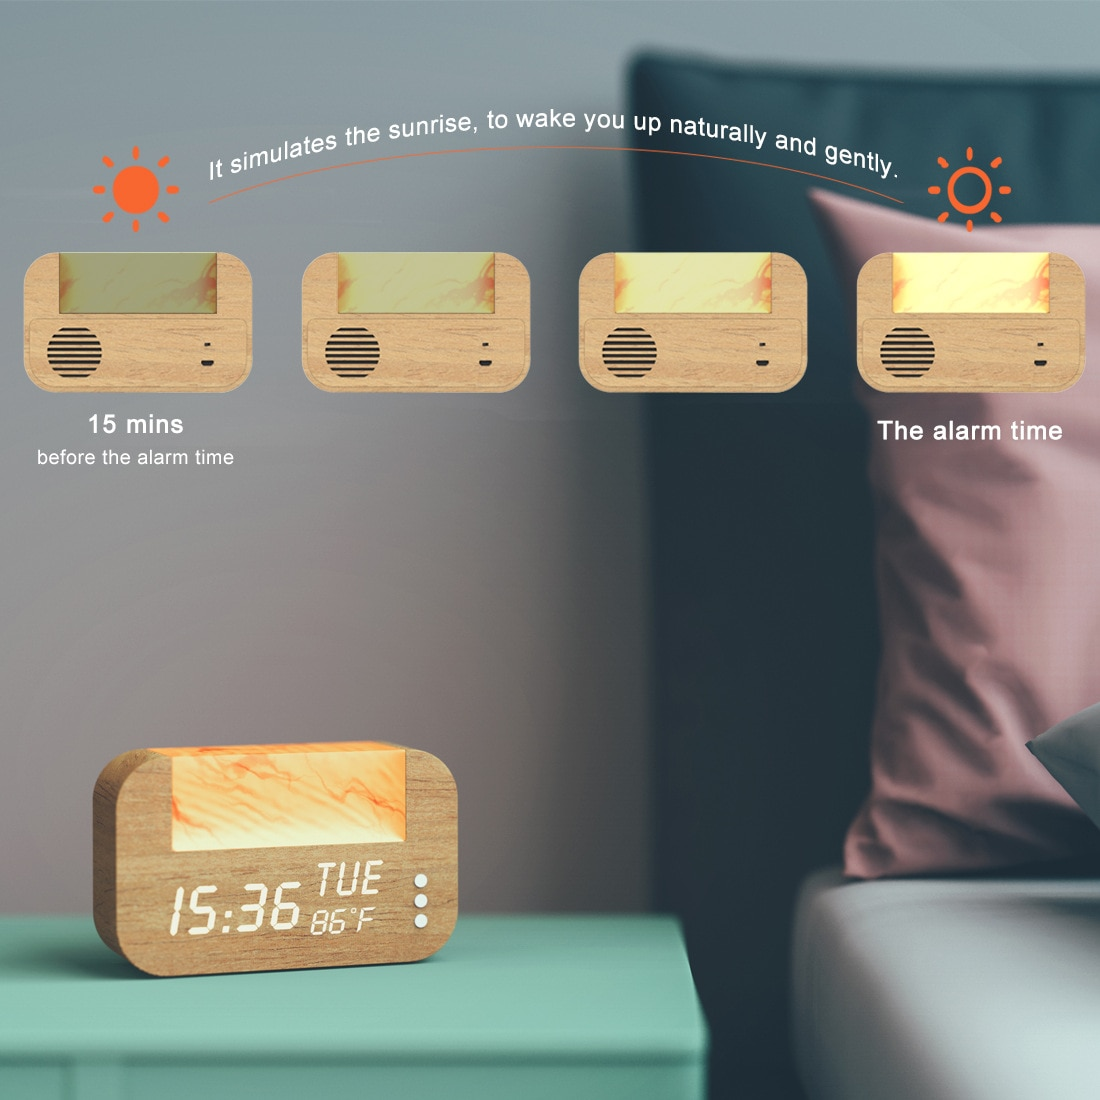 Wake-Up Light with Himalayan Salt  Alarm Clock with Real Sunrise Simulation, Himalayan Natural Salt Lamp Sleep Aid Holiday Gift enlarge